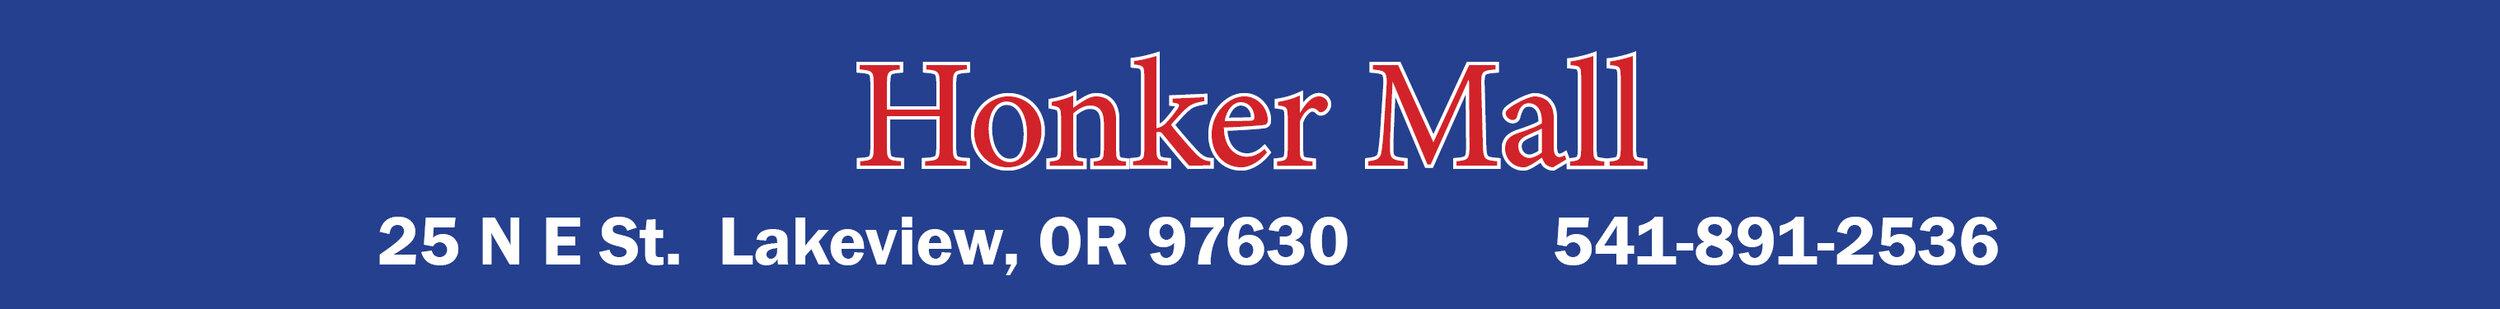 HonkerMall_Directory Cover-.jpg